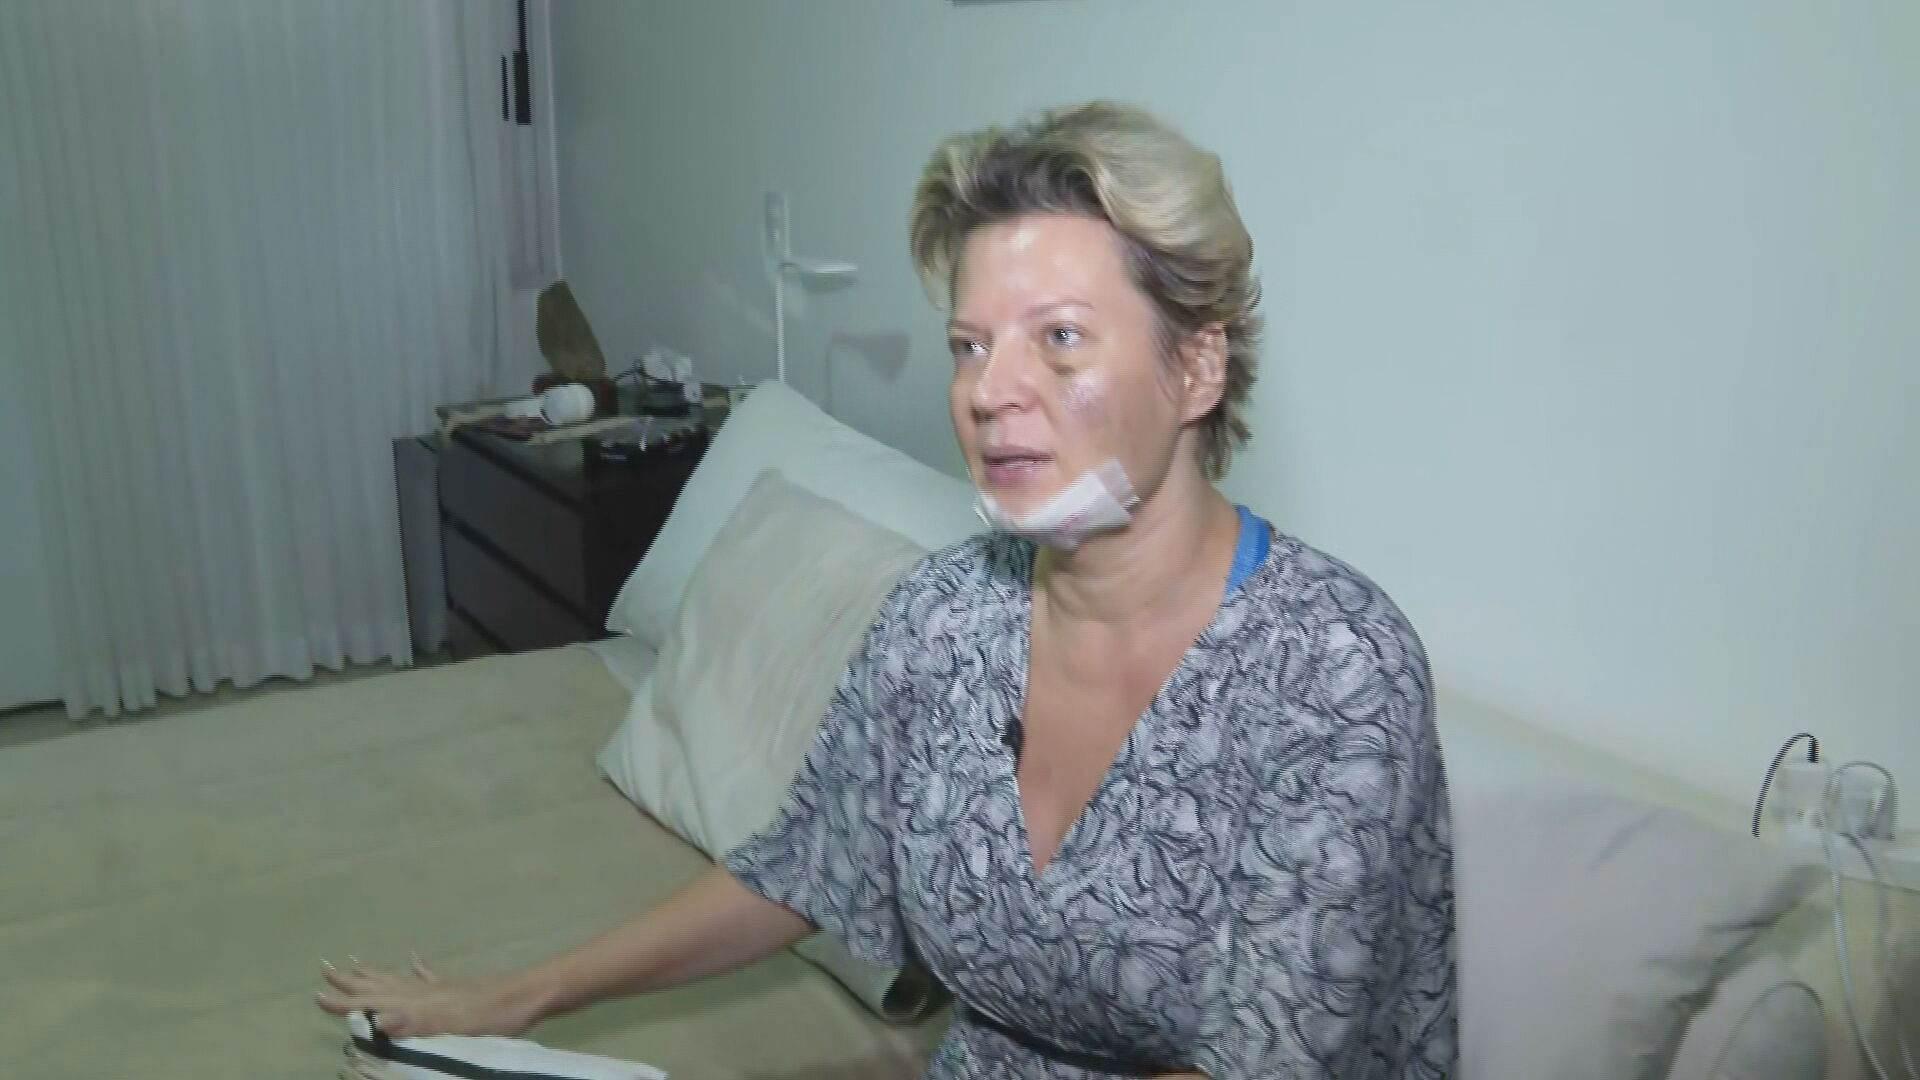 A deputada federal Joice Hasselmann (PSL-SP) mostra local das supostas agressões